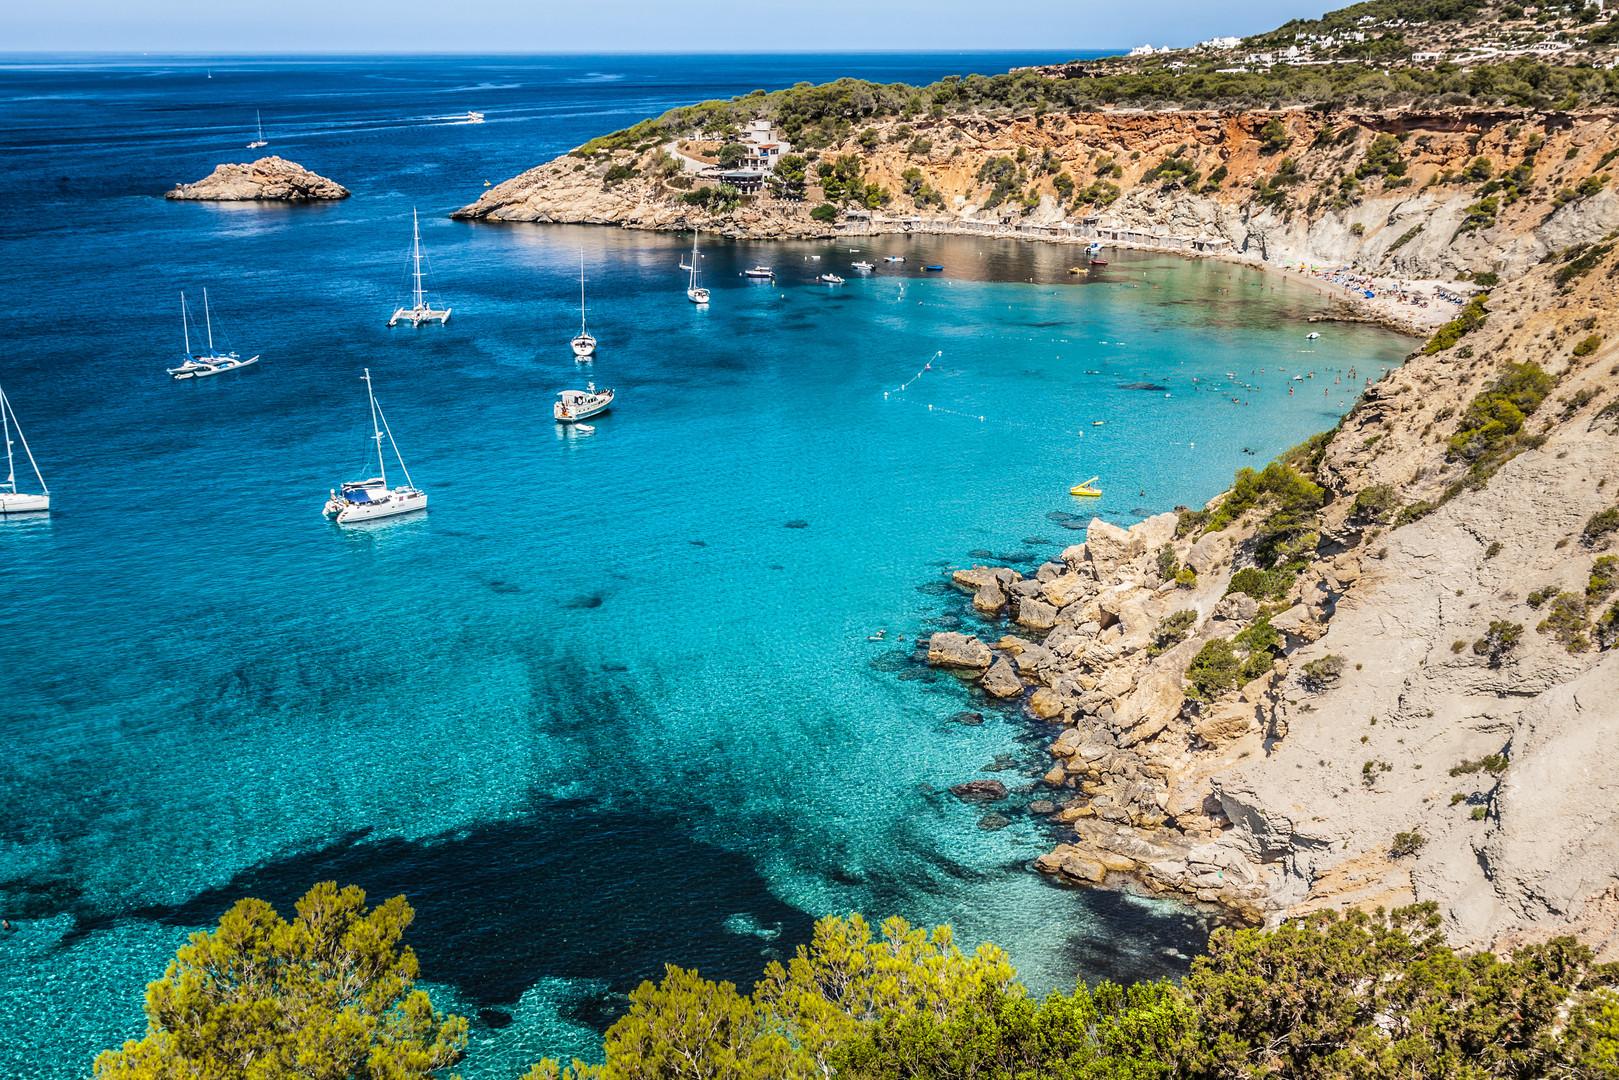 Es vedra island of Ibiza  Cala d Hort in